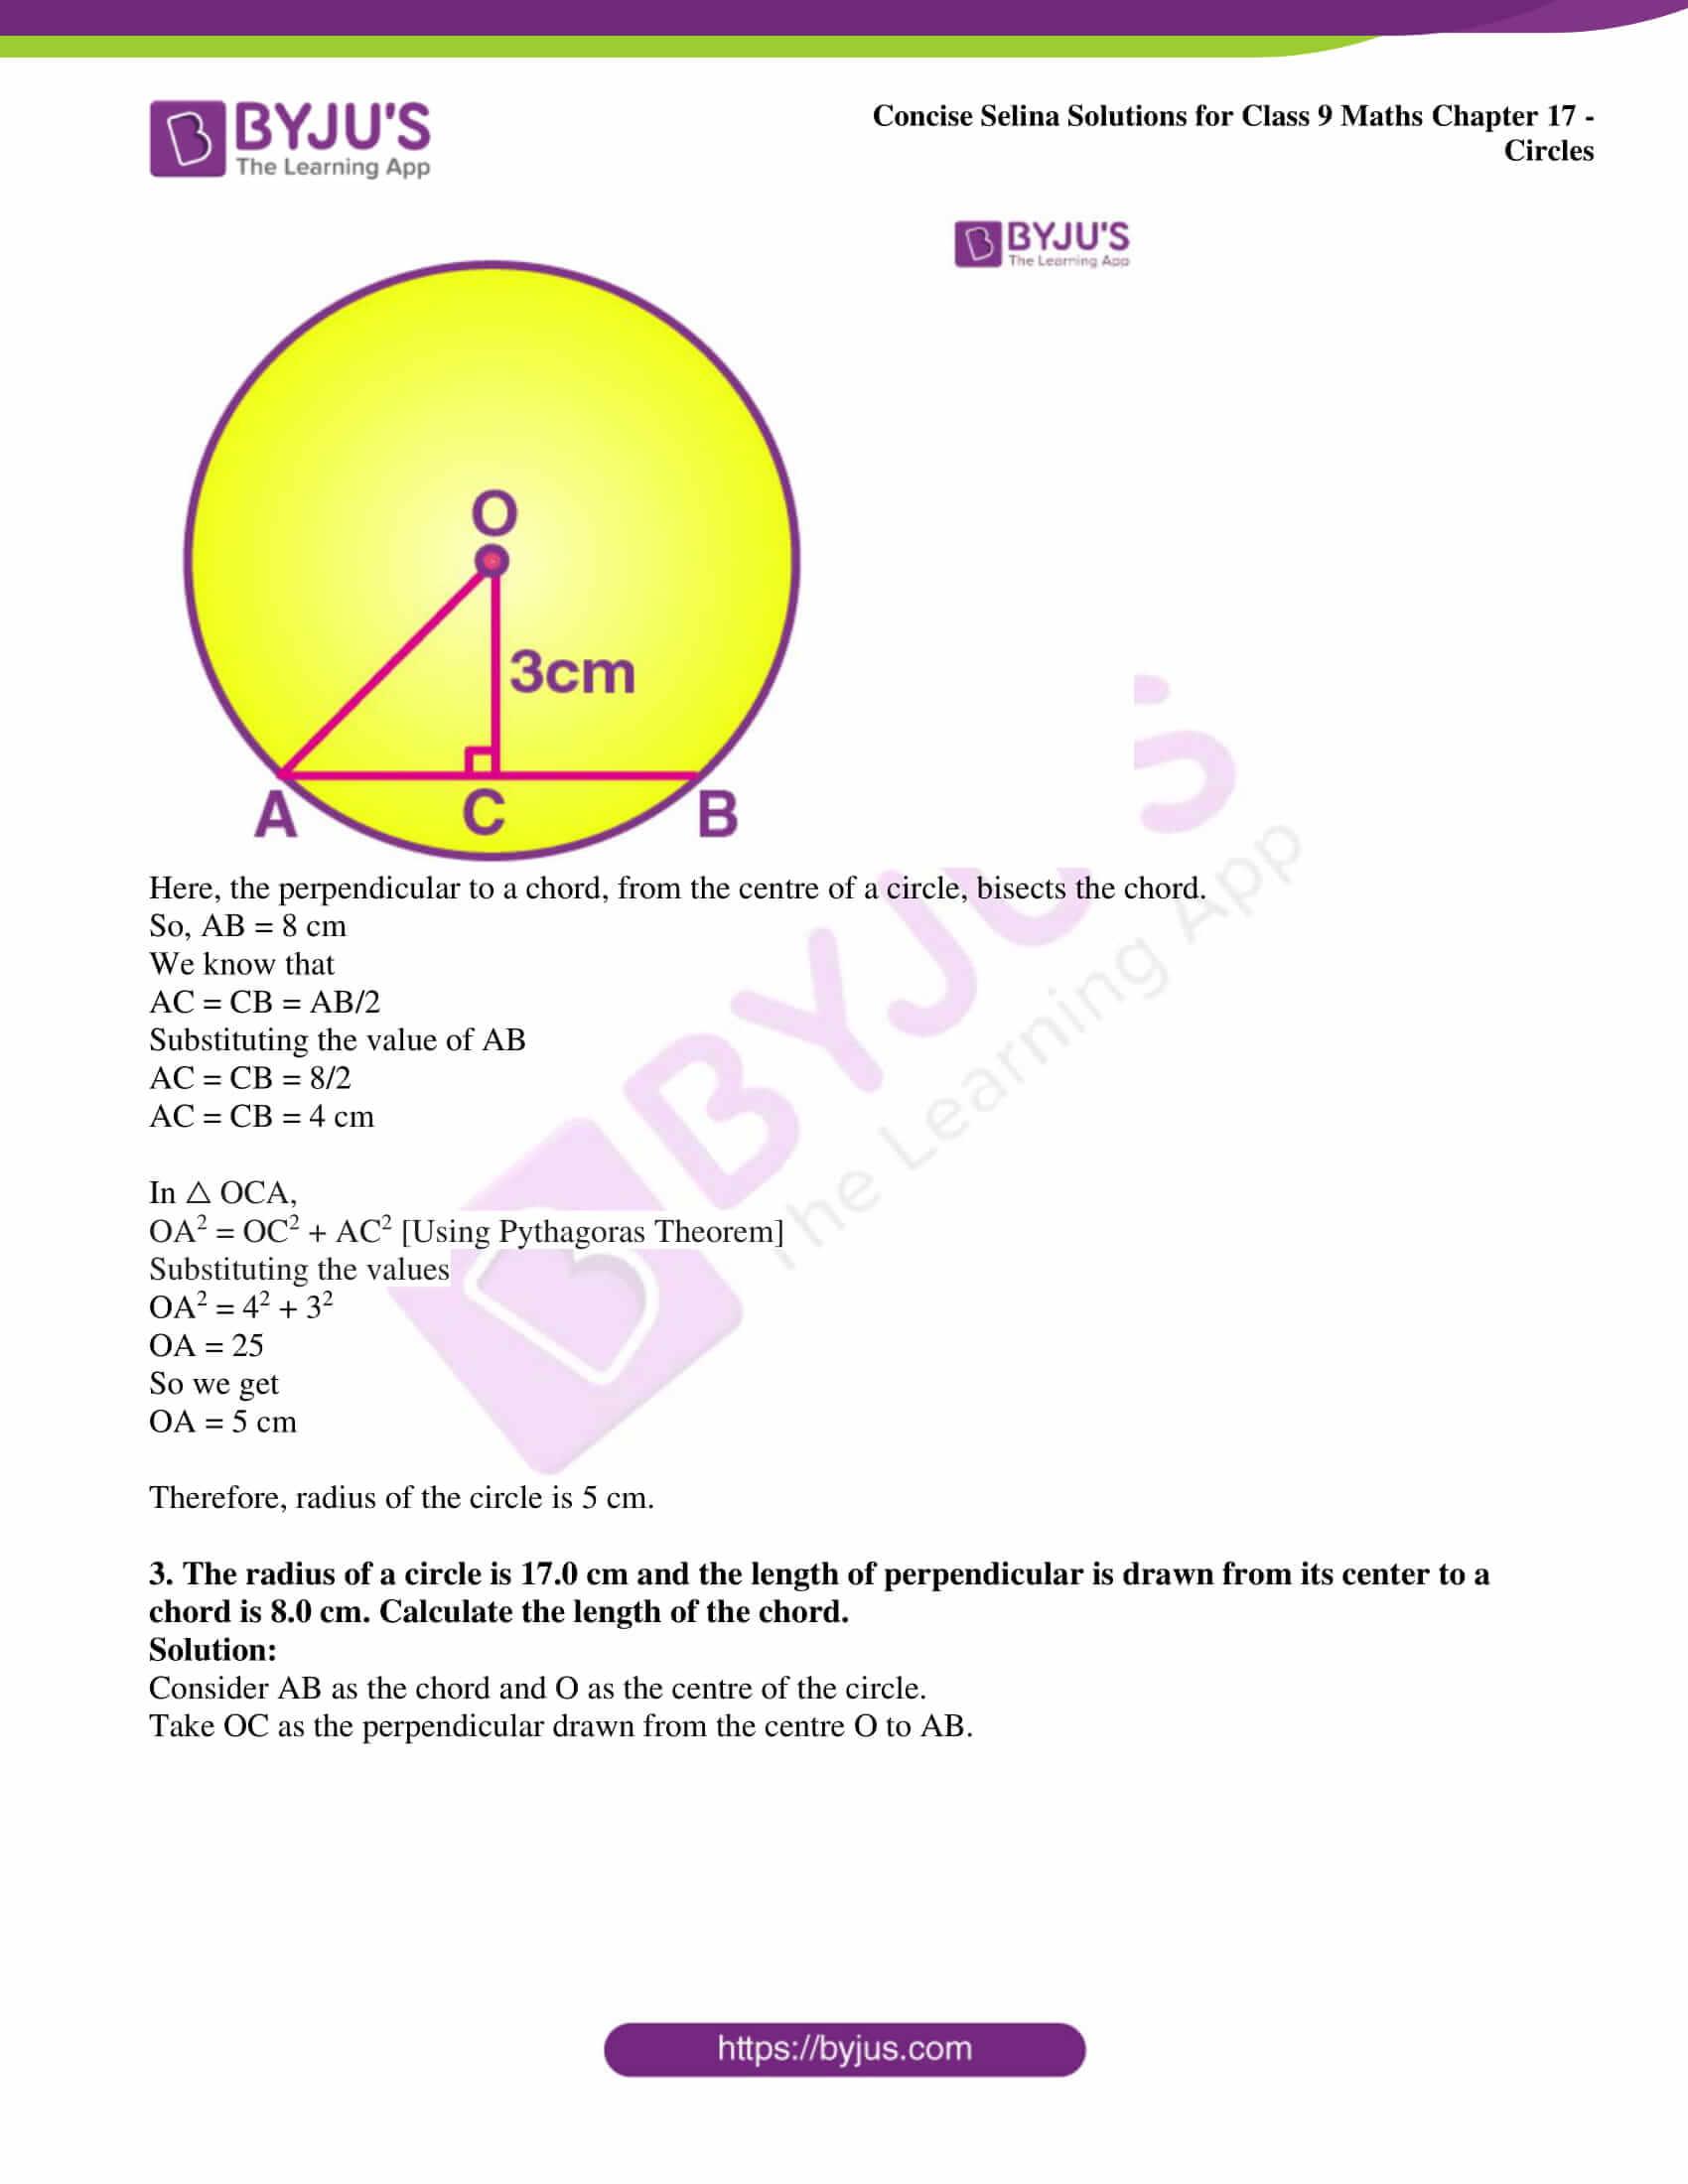 icse class 9 maths may10 selina solutions chapter 17 circles 02